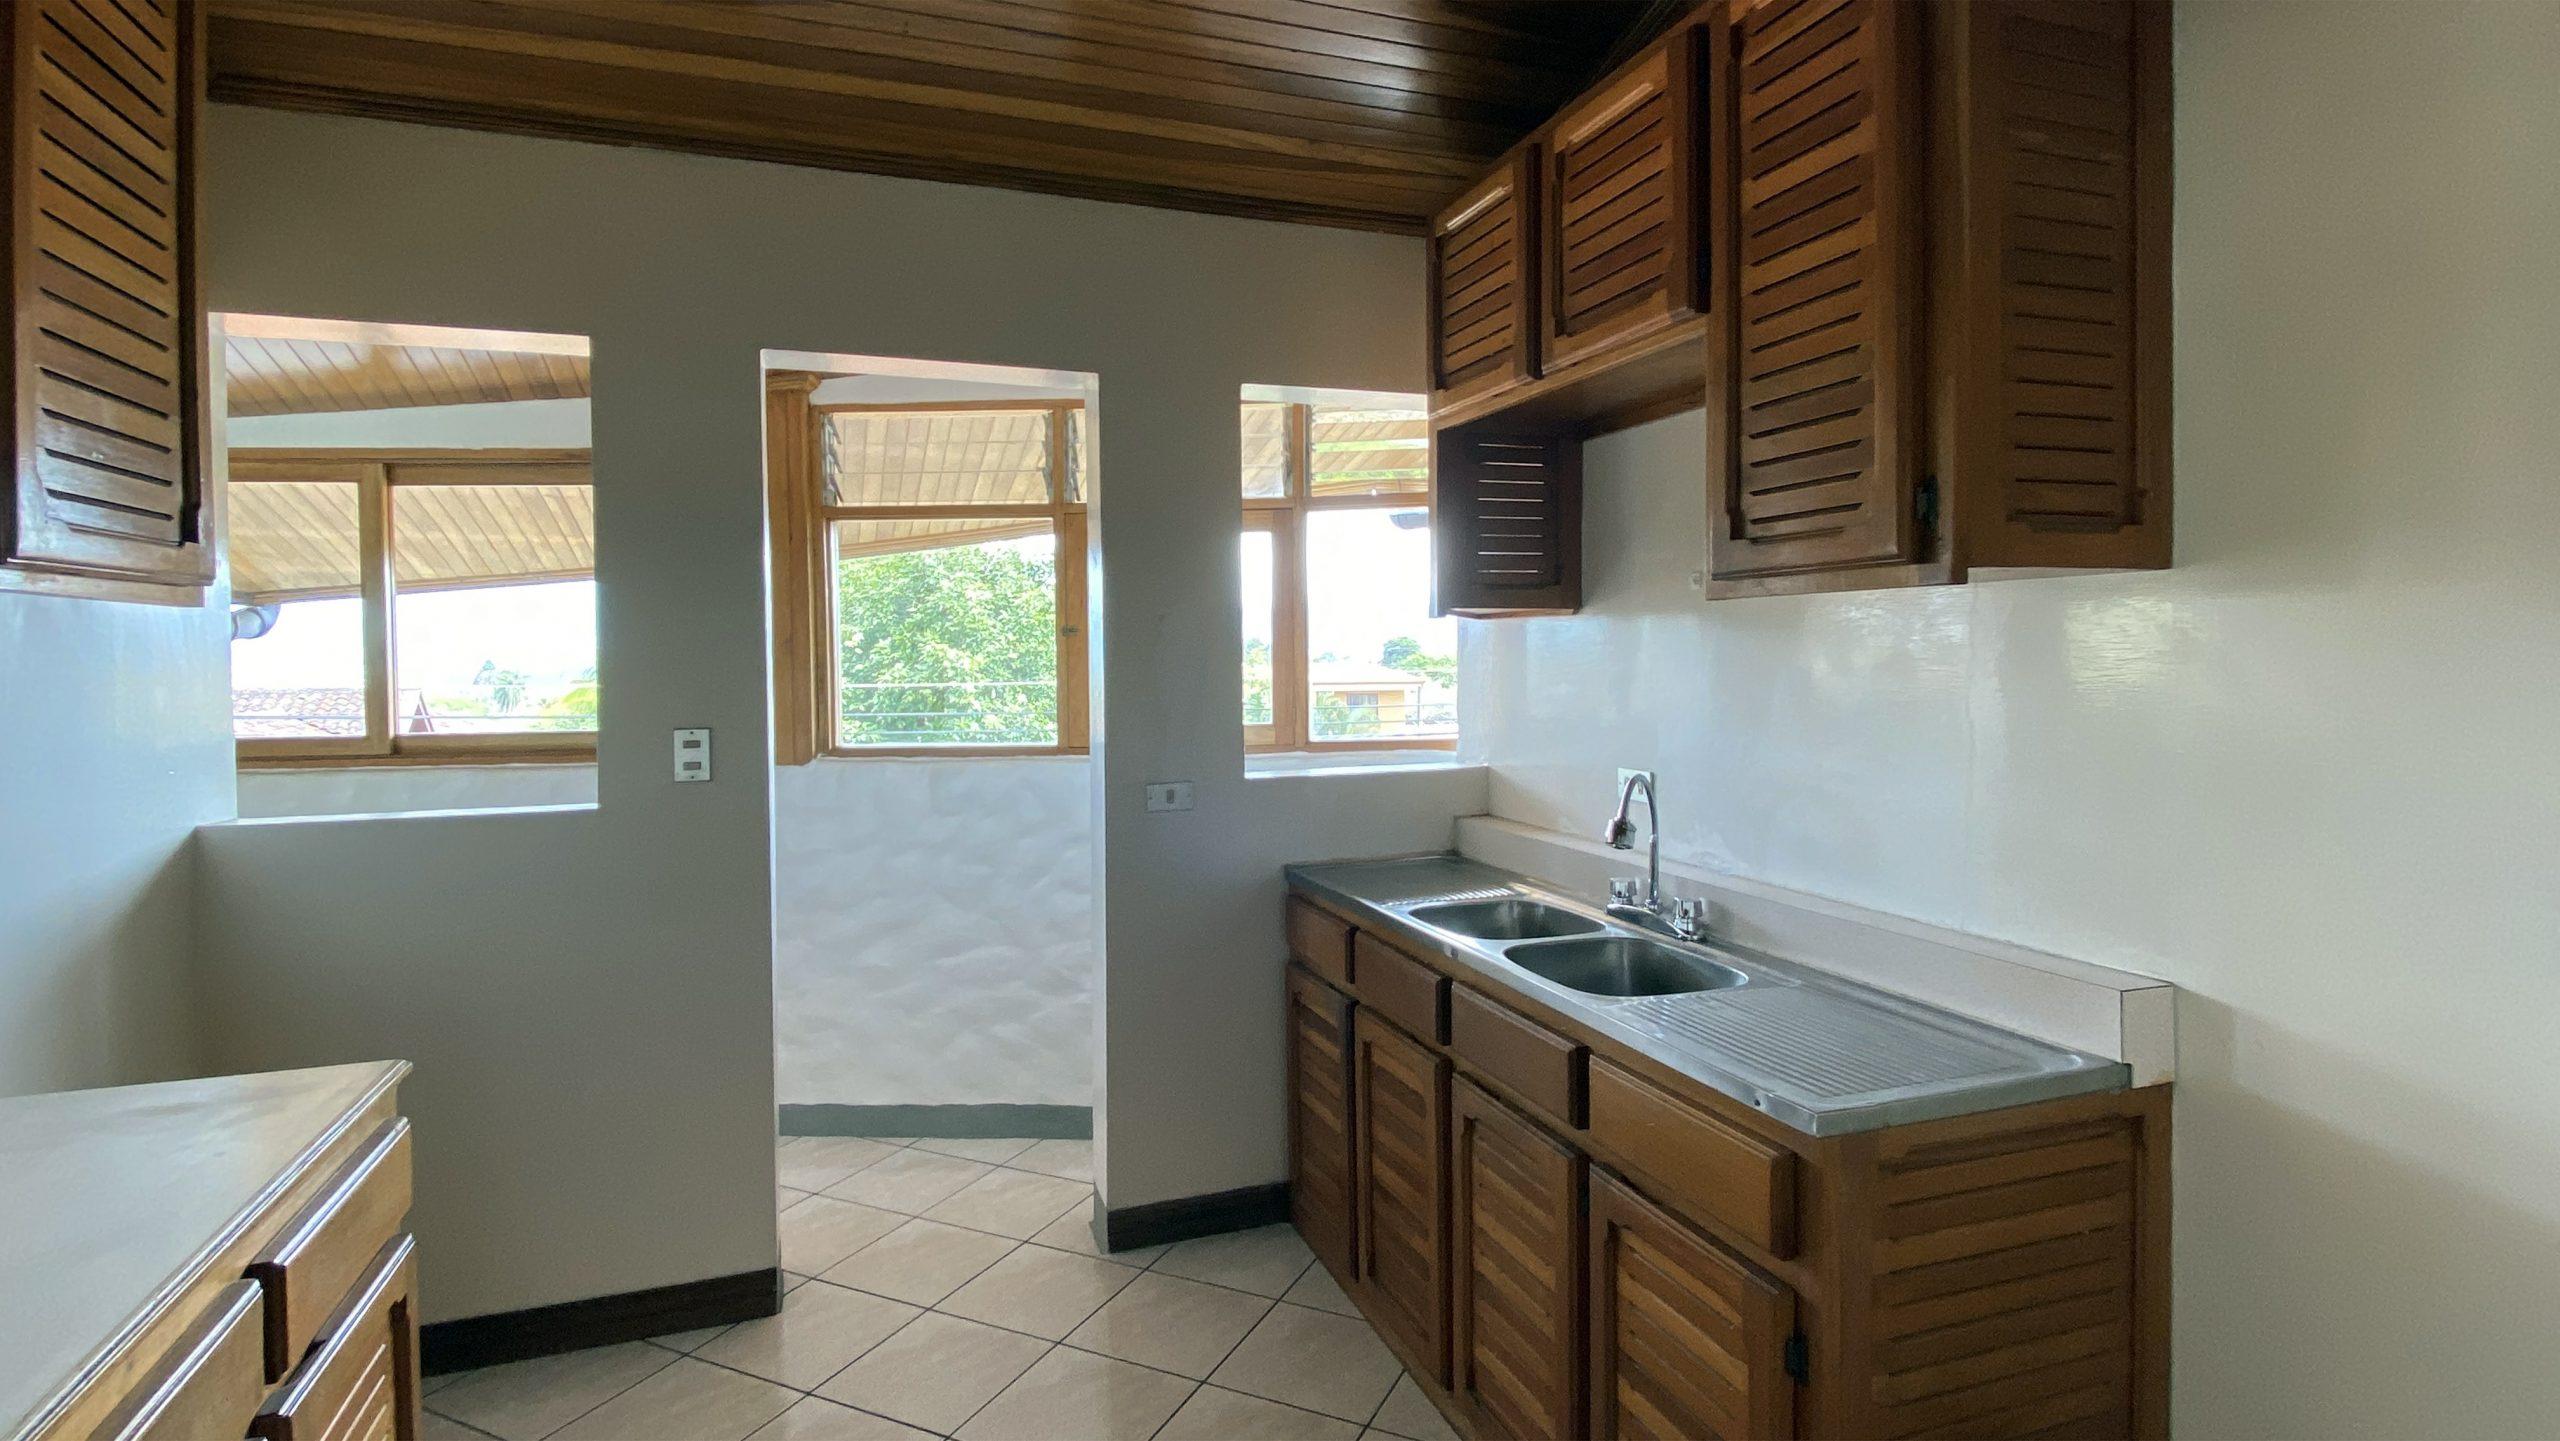 2 Bedroom Apartment For Sale Escazú